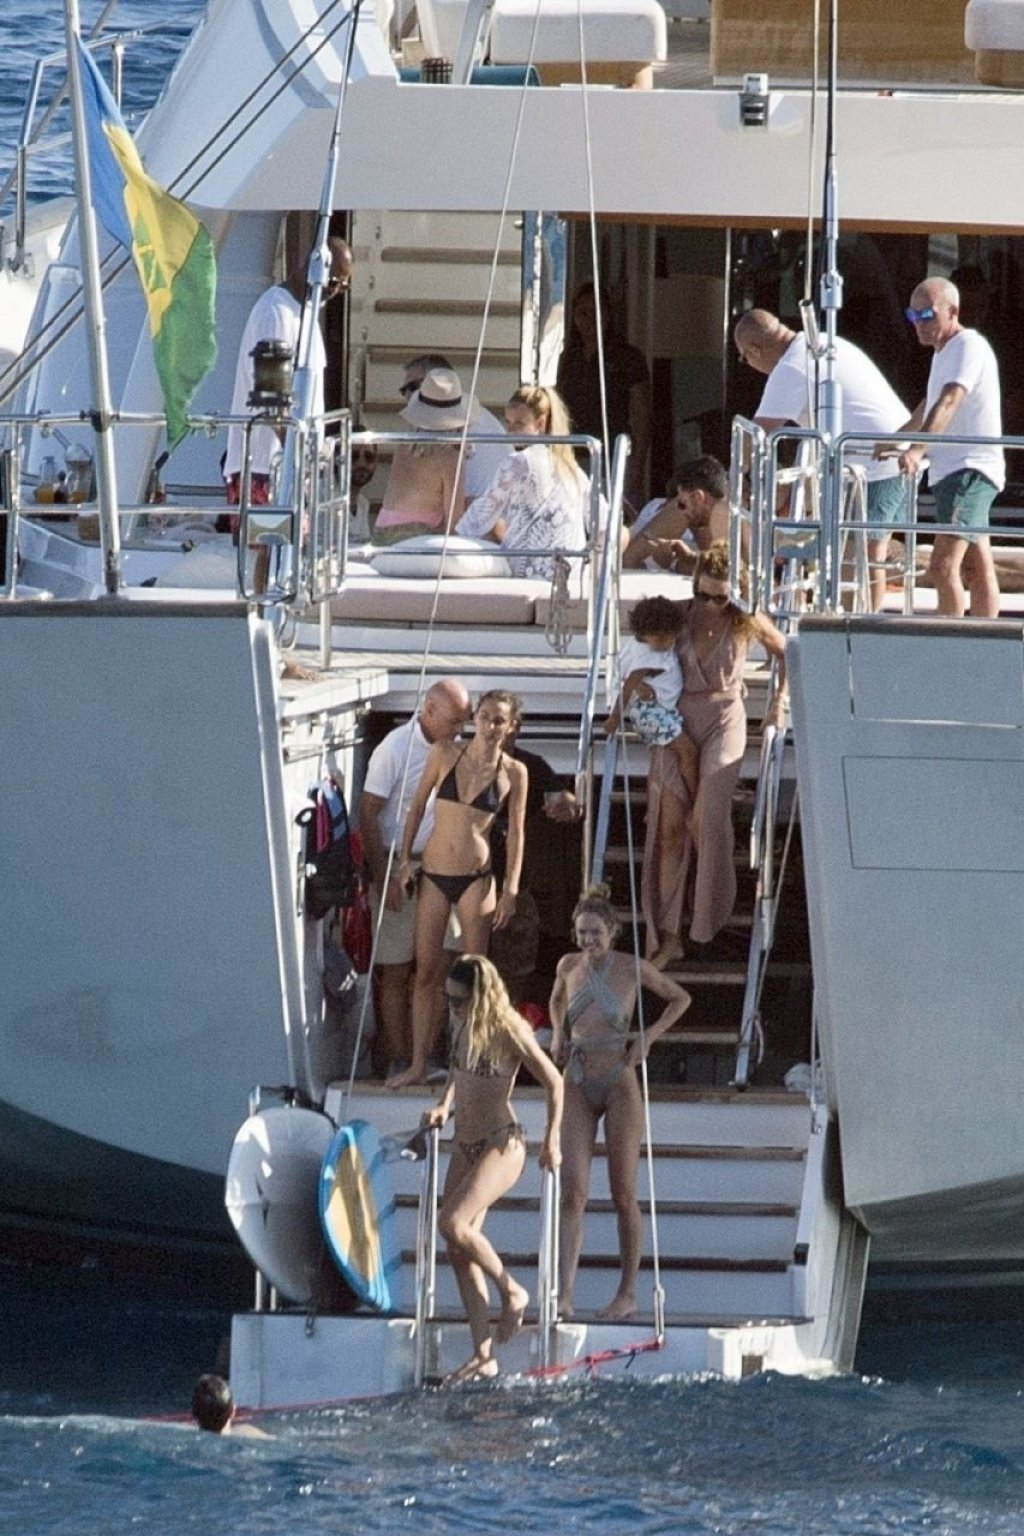 Doutzen Kroes, Candice Swanepoel, Joan Smalls Sexy (61 Photos)